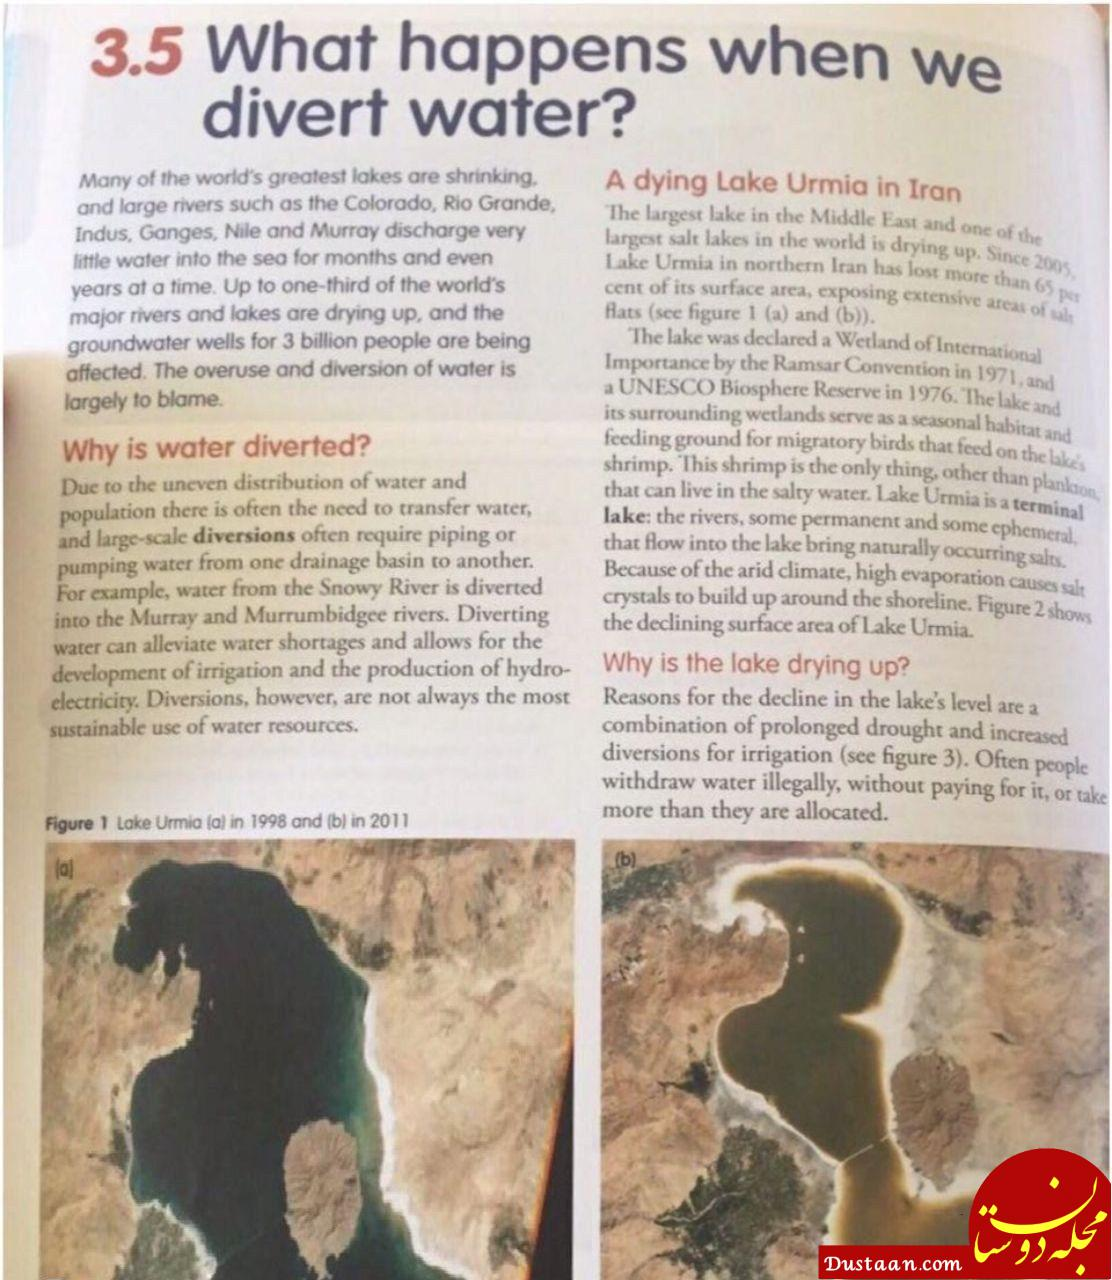 www.dustaan.com خشک شدن دریاچه ارومیه در کتاب درسی استرالیایی ها! +عکس